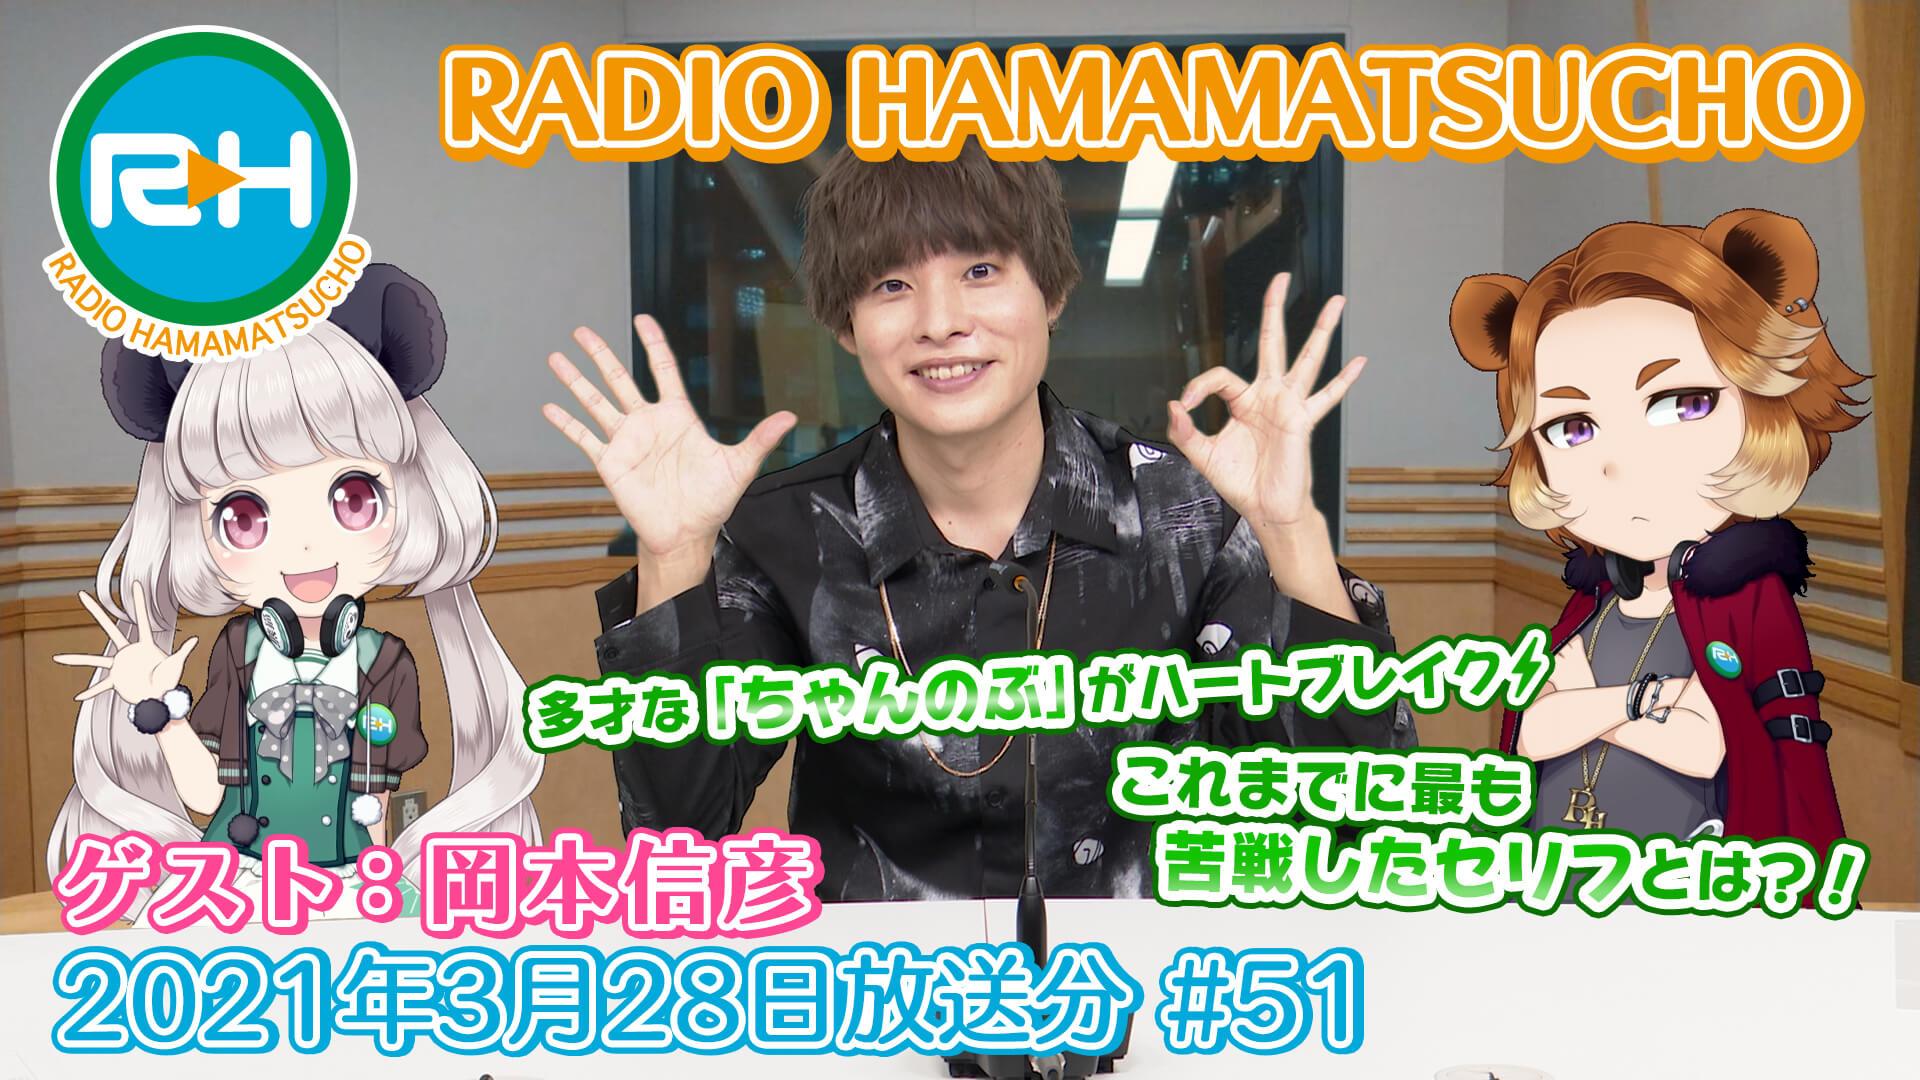 RADIO HAMAMATSUCHO 第51回 (2021年3月28日放送分) ゲスト: 岡本信彦